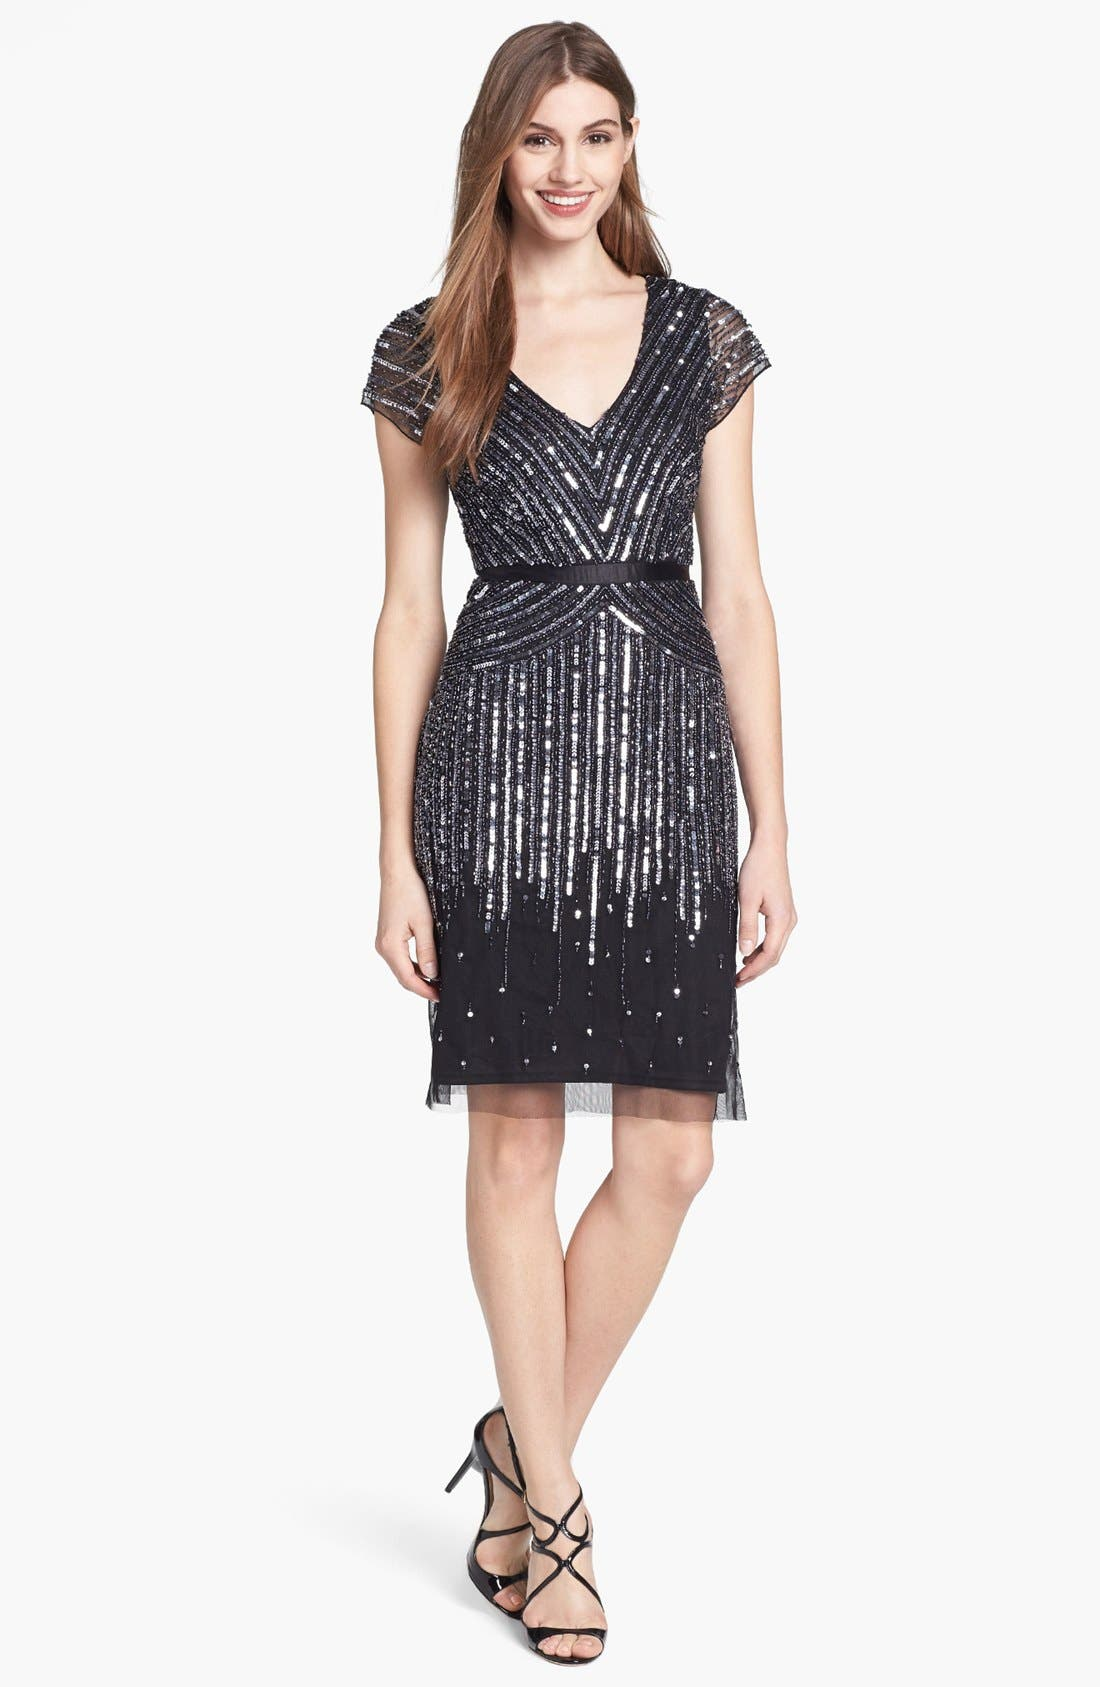 Main Image - Adrianna Papell Embellished Mesh Dress (Regular & Petite)